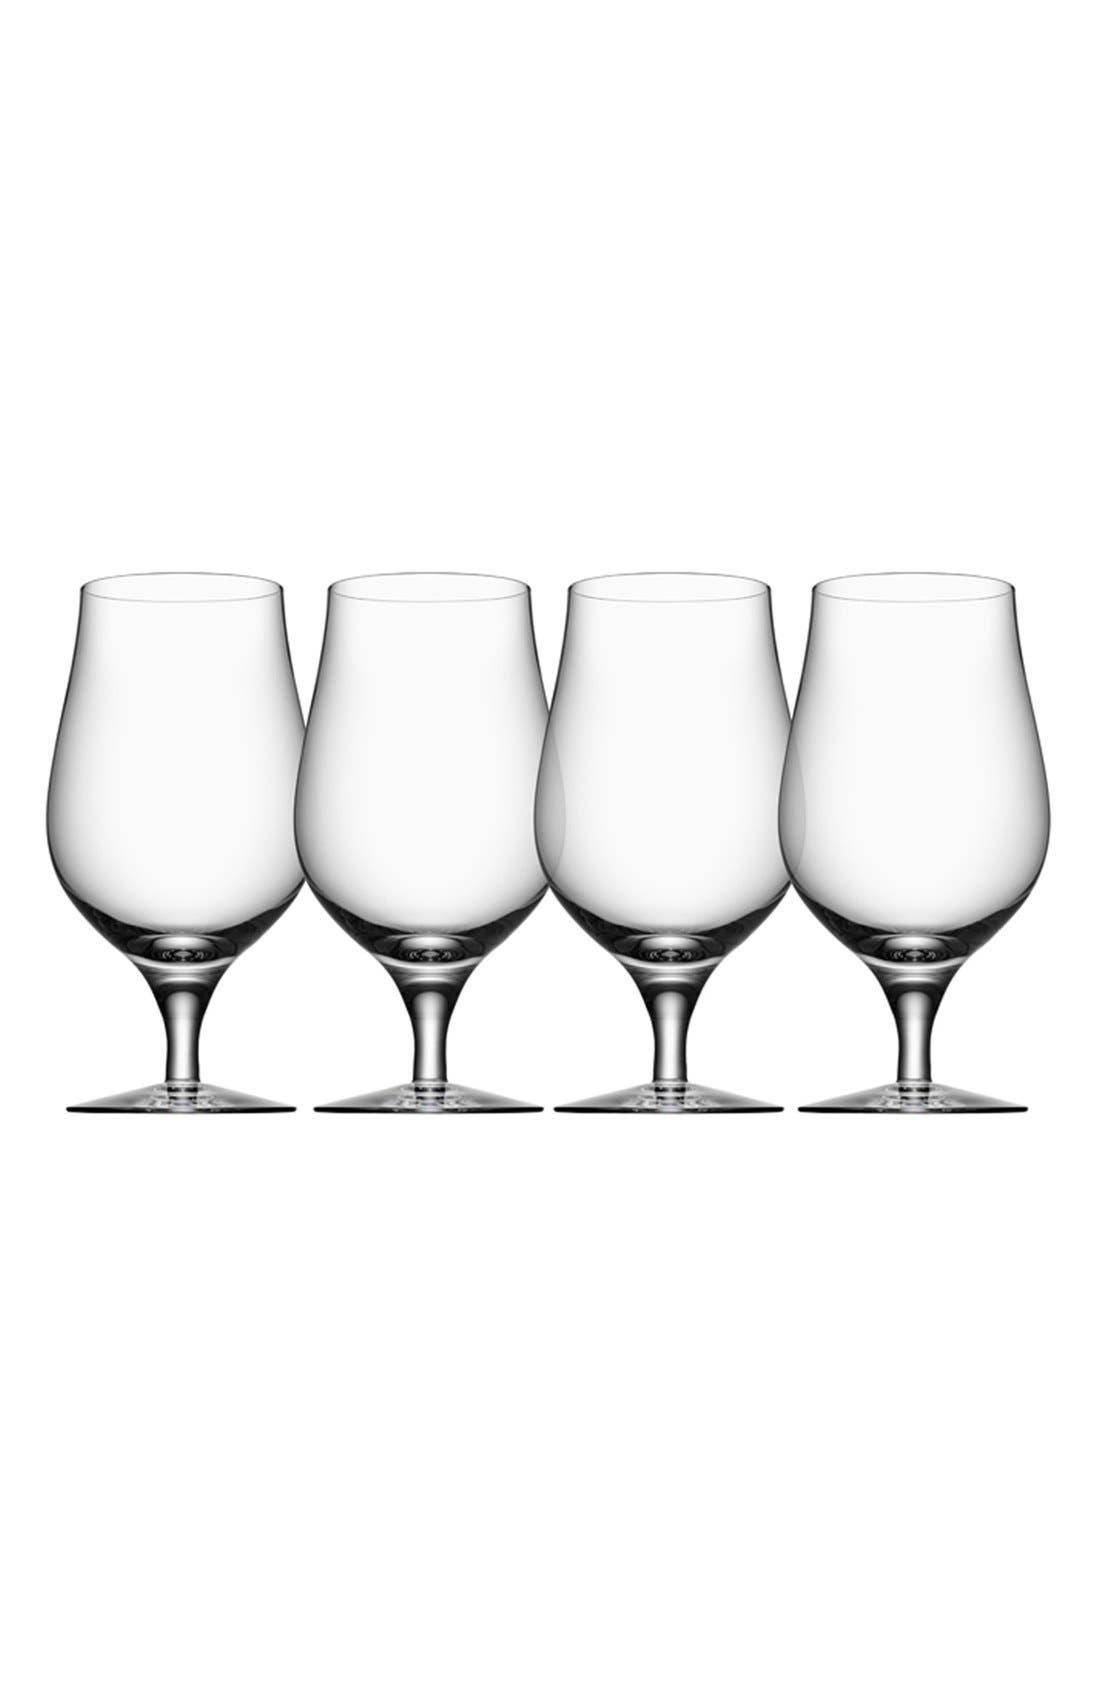 'Taster' Glasses,                             Main thumbnail 1, color,                             100